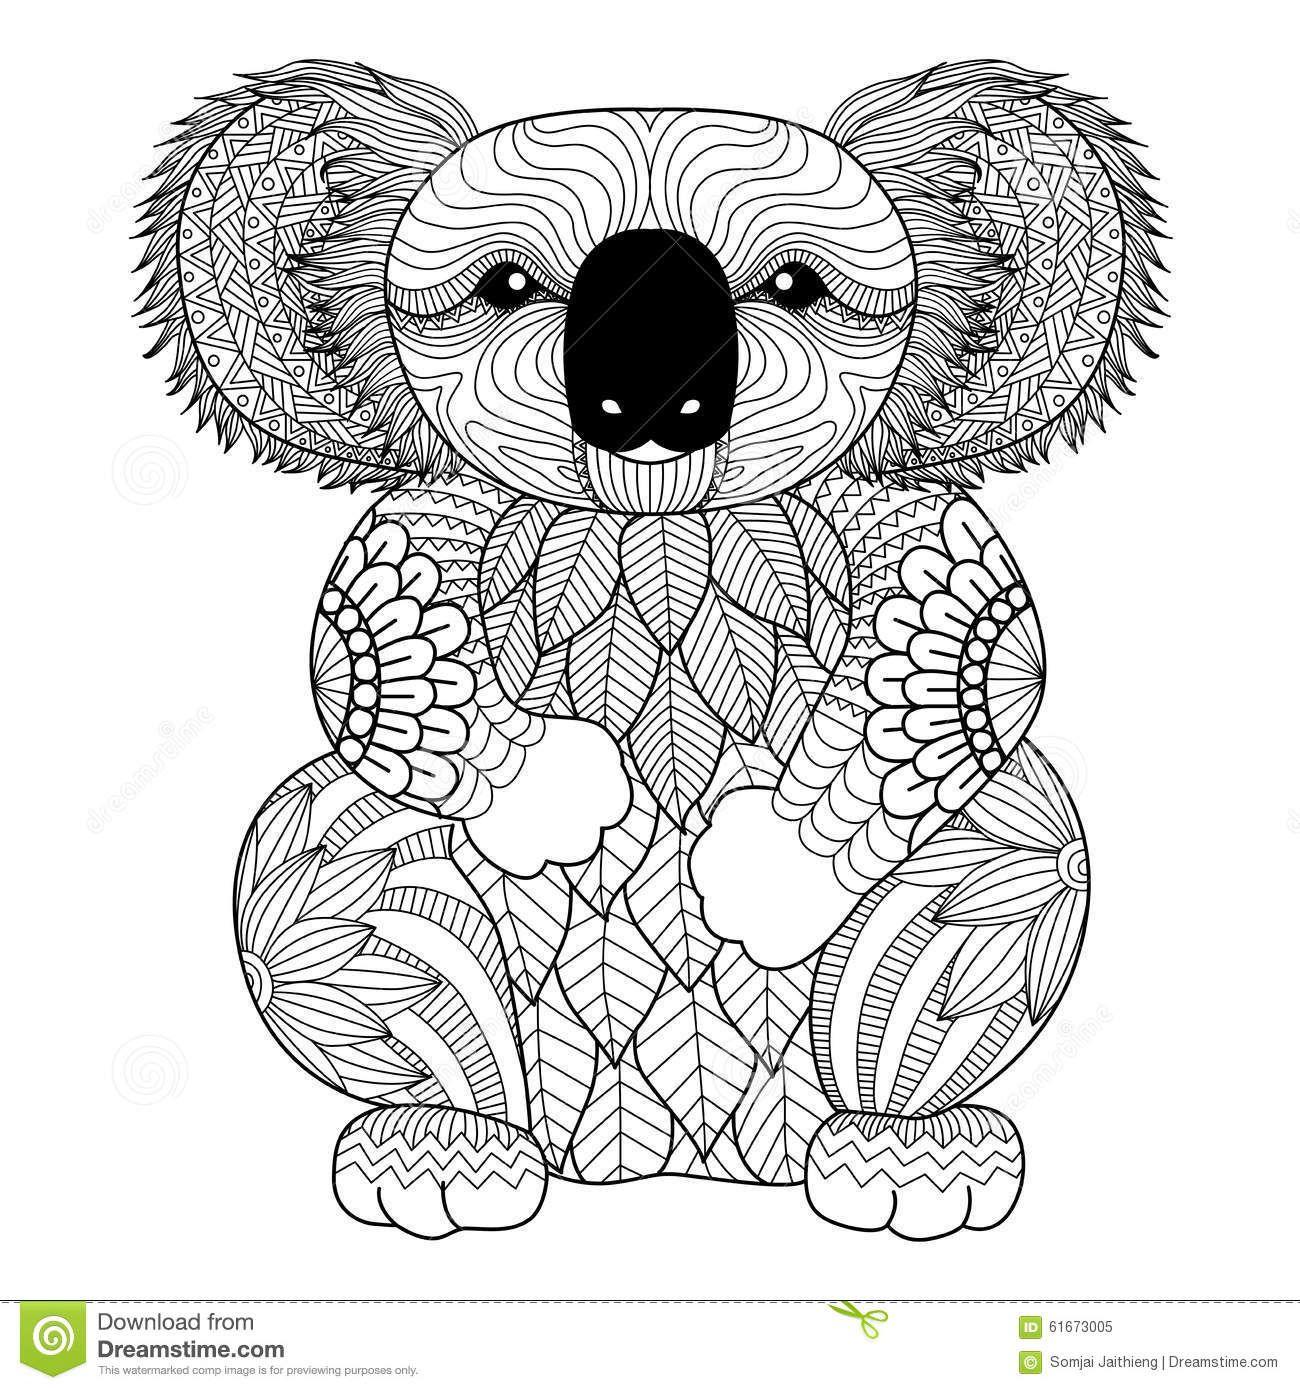 Pin Auf Ausmalbilder in Koala Ausmalbild